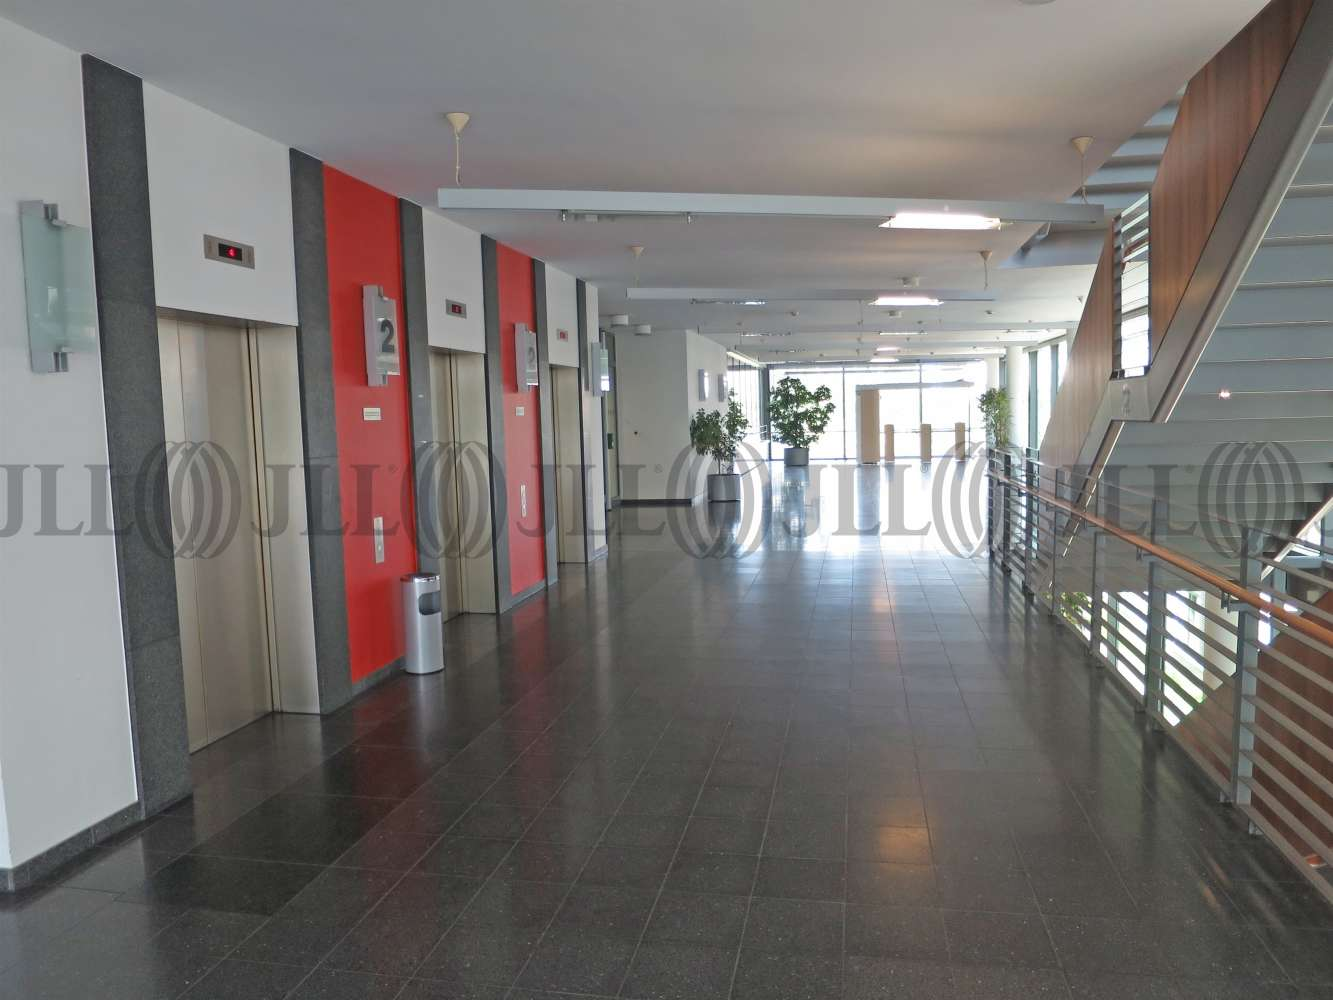 Büros Offenbach am main, 63067 - Büro - Offenbach am Main, Kaiserlei - F1436 - 10729789